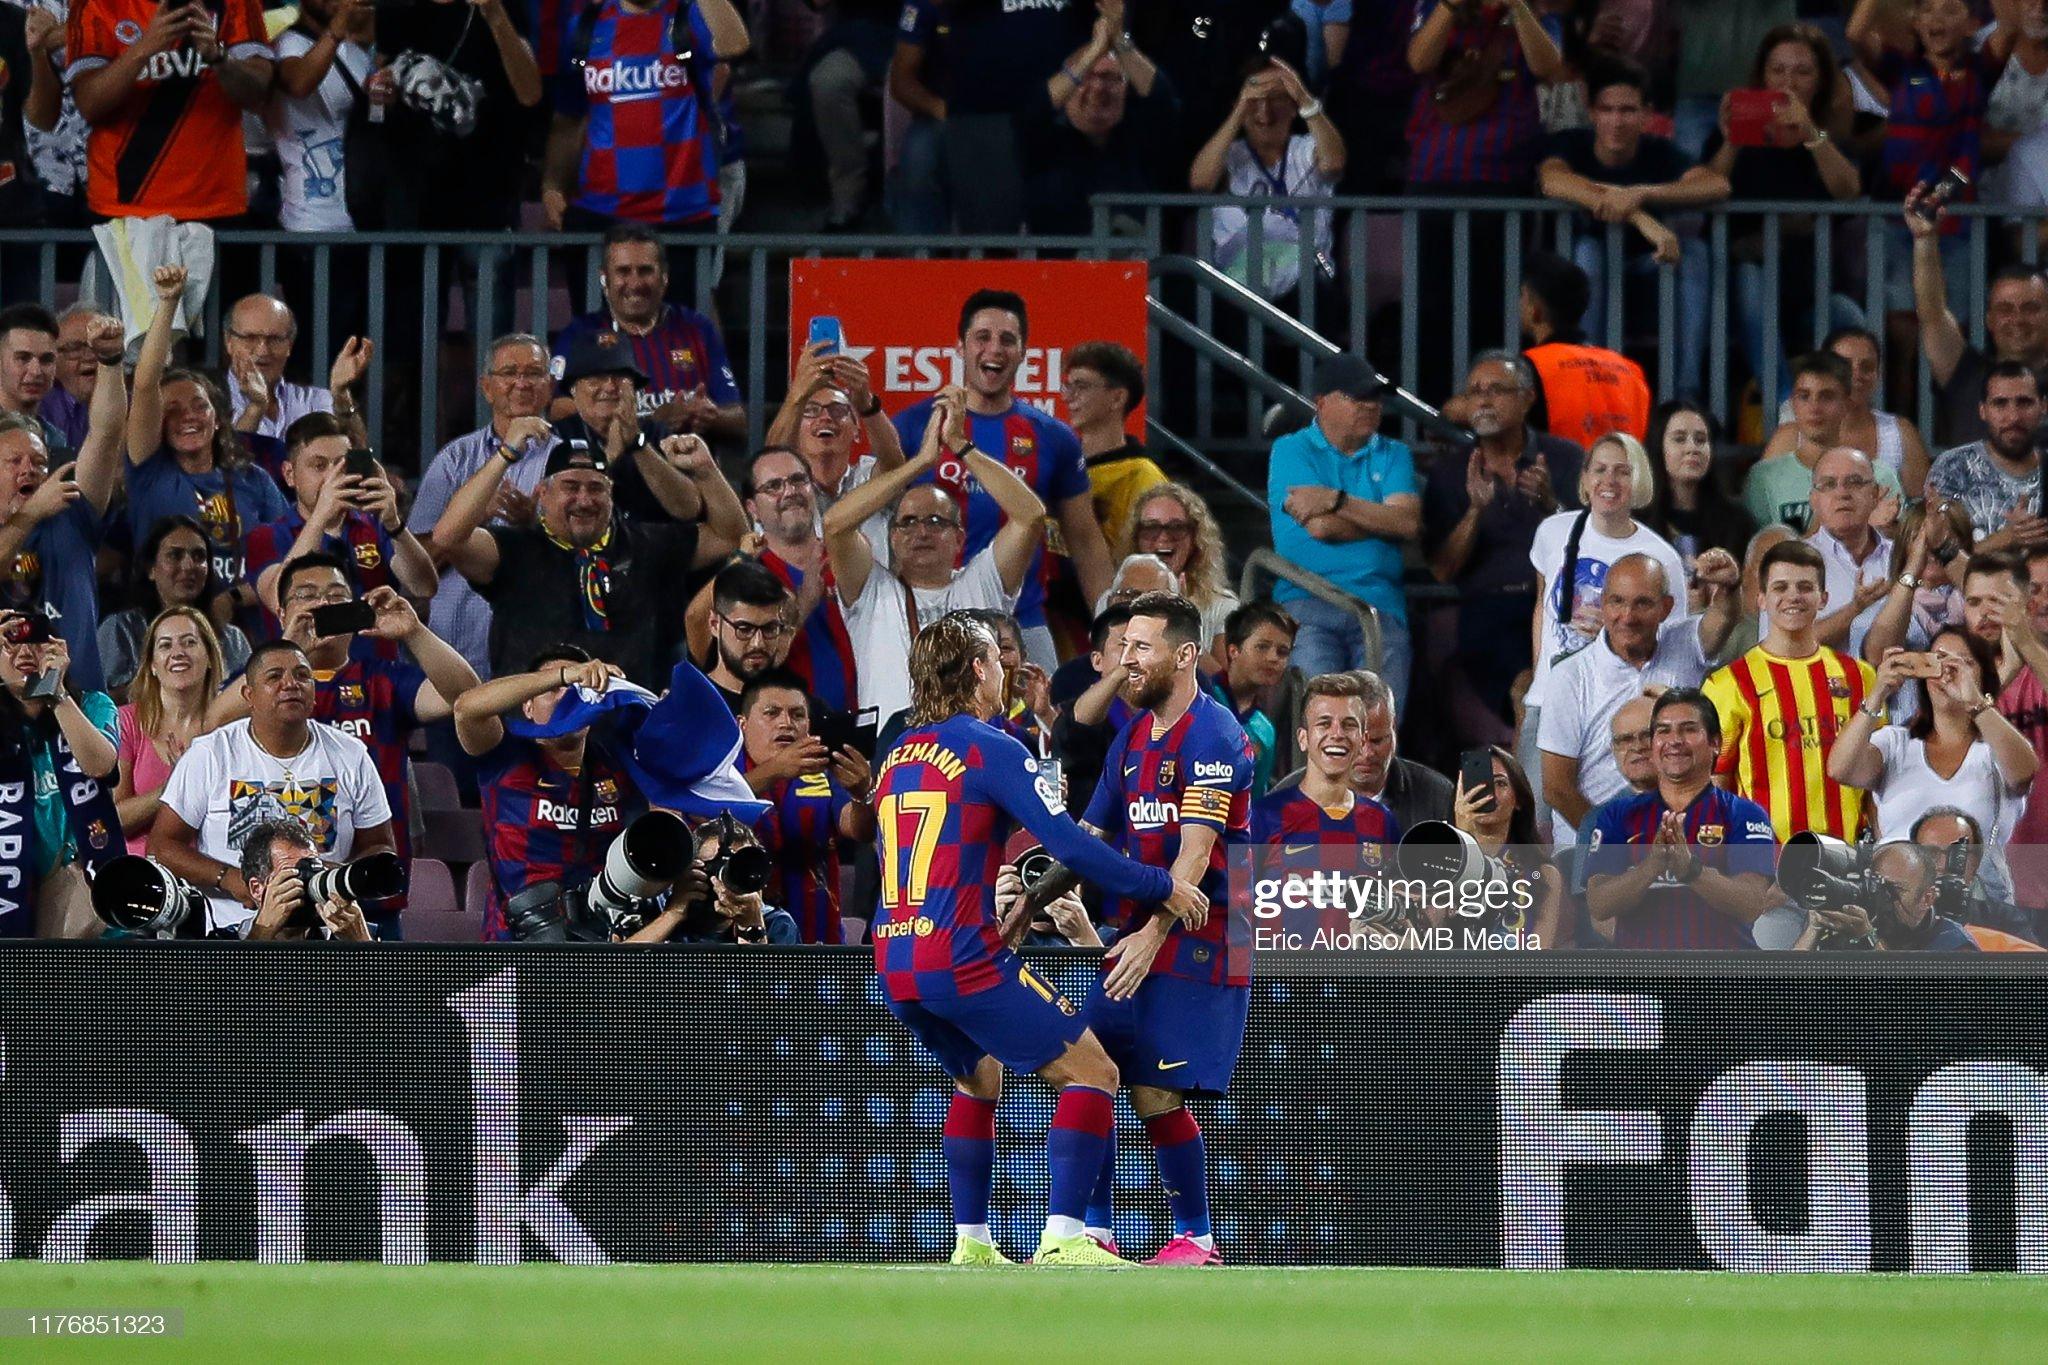 صور مباراة : برشلونة - فياريال 2-1 ( 24-09-2019 )  Lionel-messi-of-fc-barcelona-and-antoine-griezmann-celebrates-the-10-picture-id1176851323?s=2048x2048